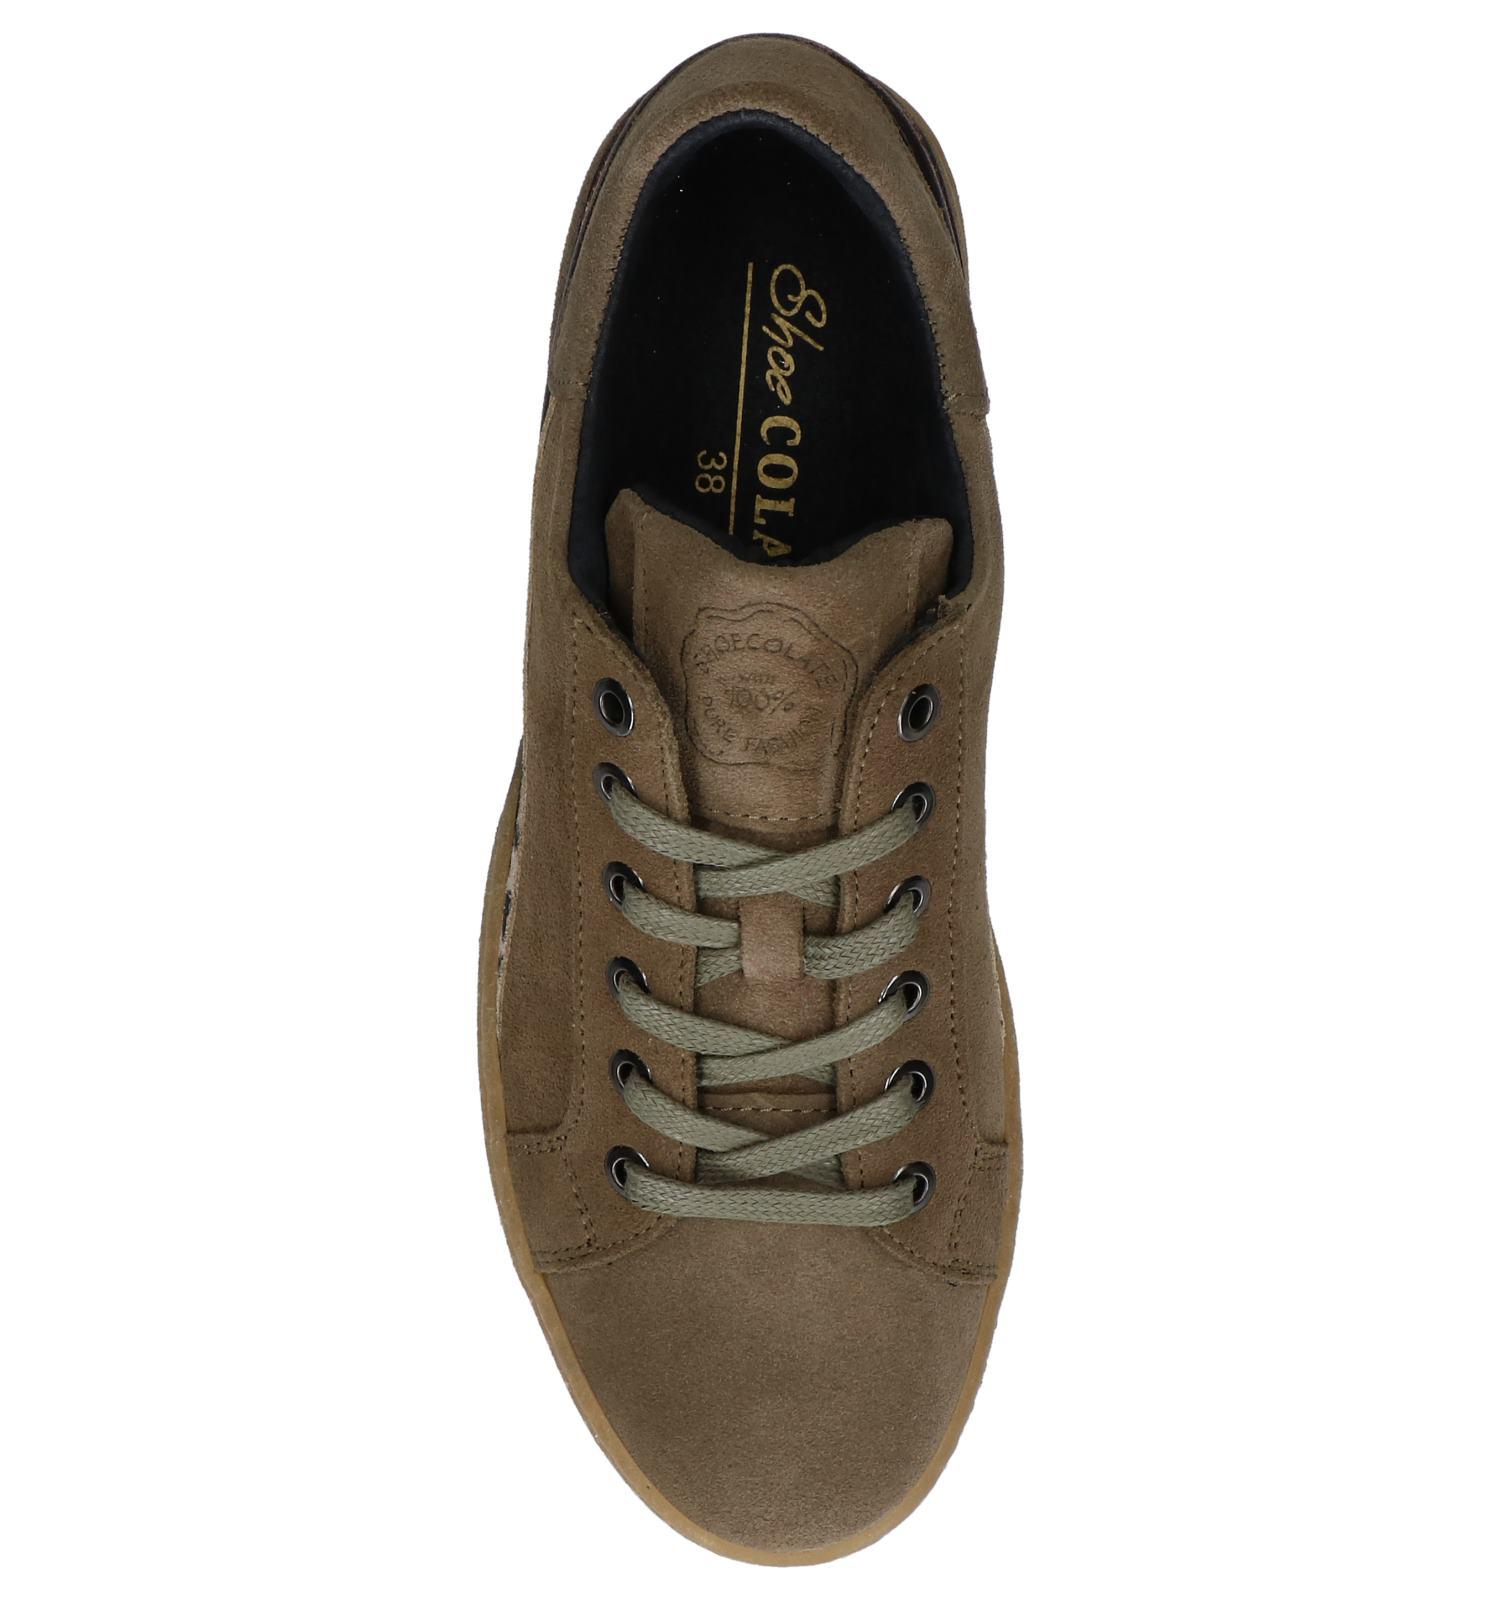 Sneakers Shoecolate Shoecolate Shoecolate Sneakers Kaki Shoecolate Kaki Sneakers Kaki Kaki Kaki Shoecolate Sneakers Sneakers rCxQdoWBe